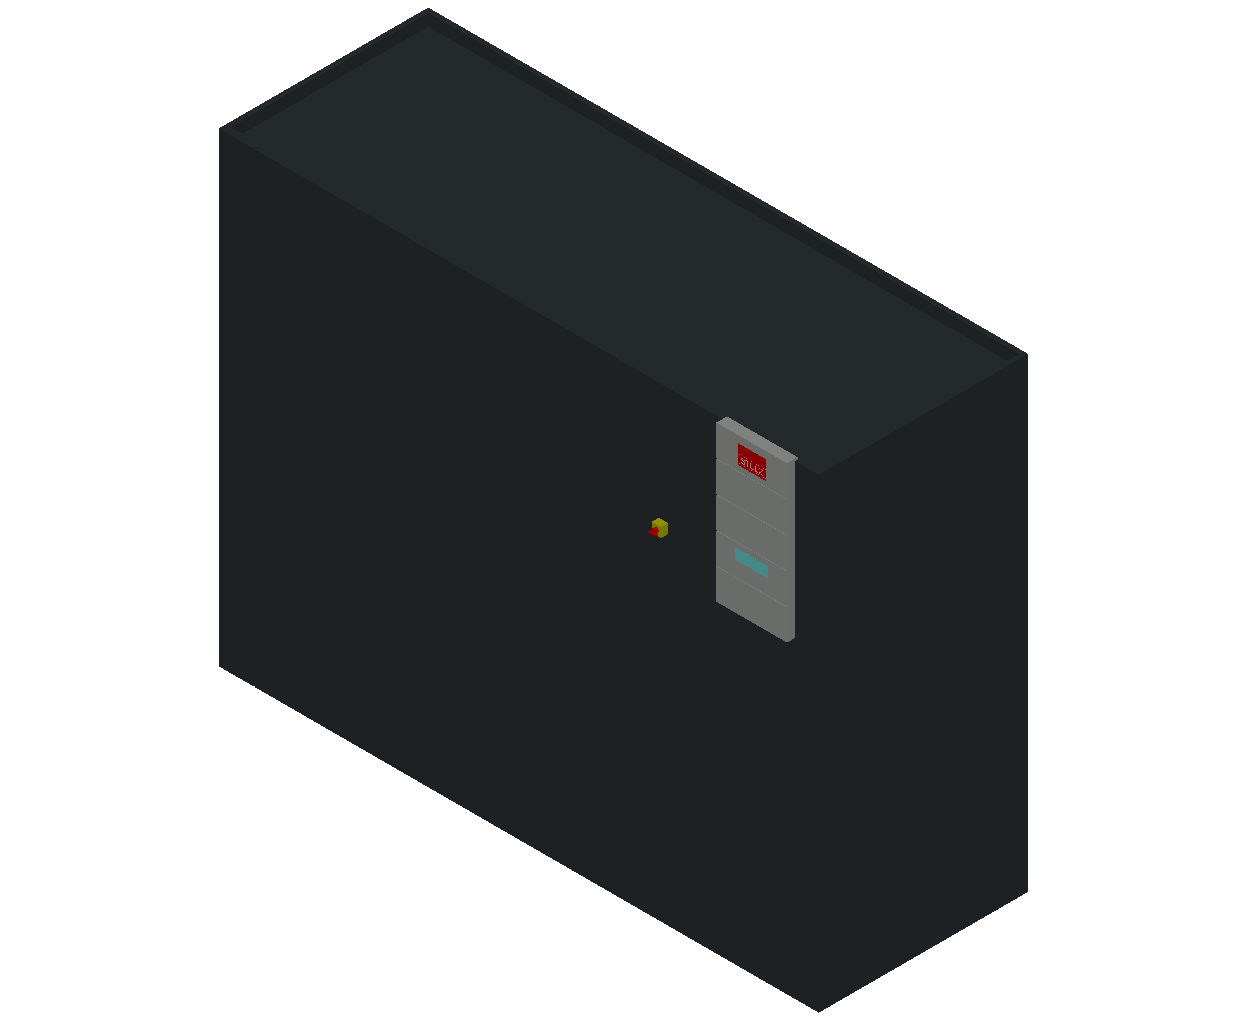 HC_Air Conditioner_Indoor Unit_MEPcontent_STULZ_CyberAir 3PRO_ALD_Dual Circuit GE_ALD_862_GE_INT-EN.dwg